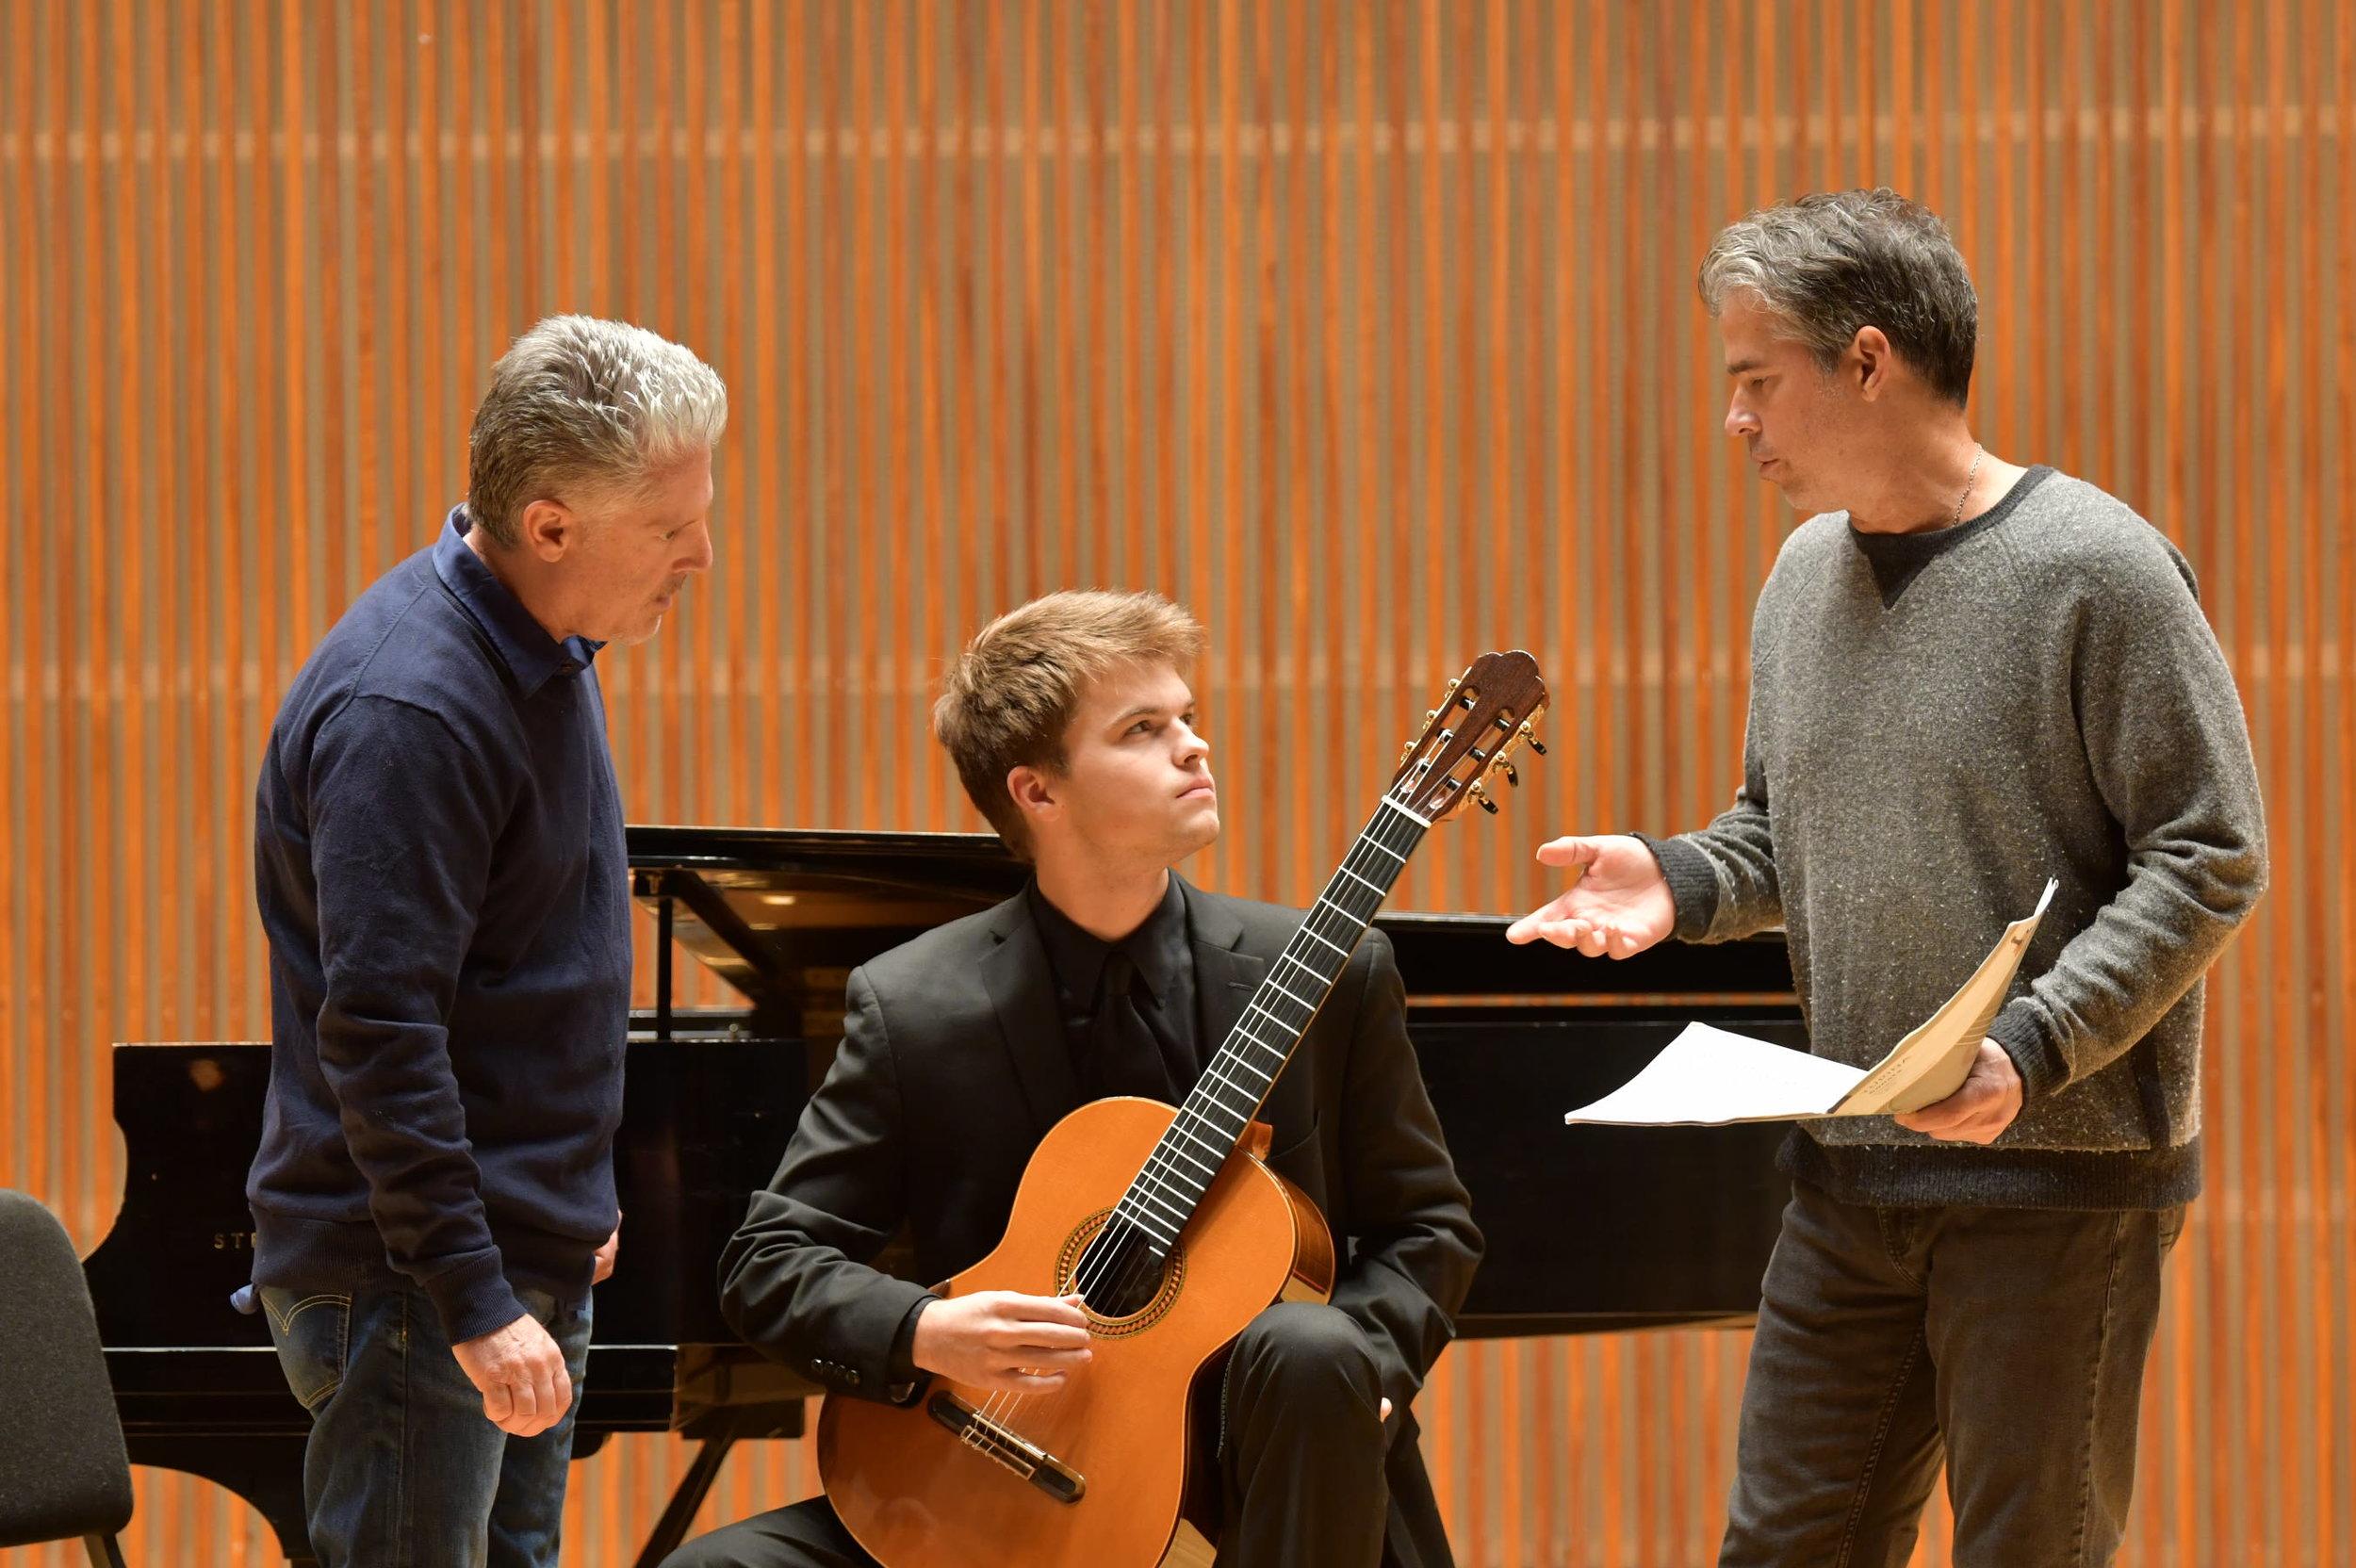 Craig Slagh played the first movement of Joaquin Turina's Sonata